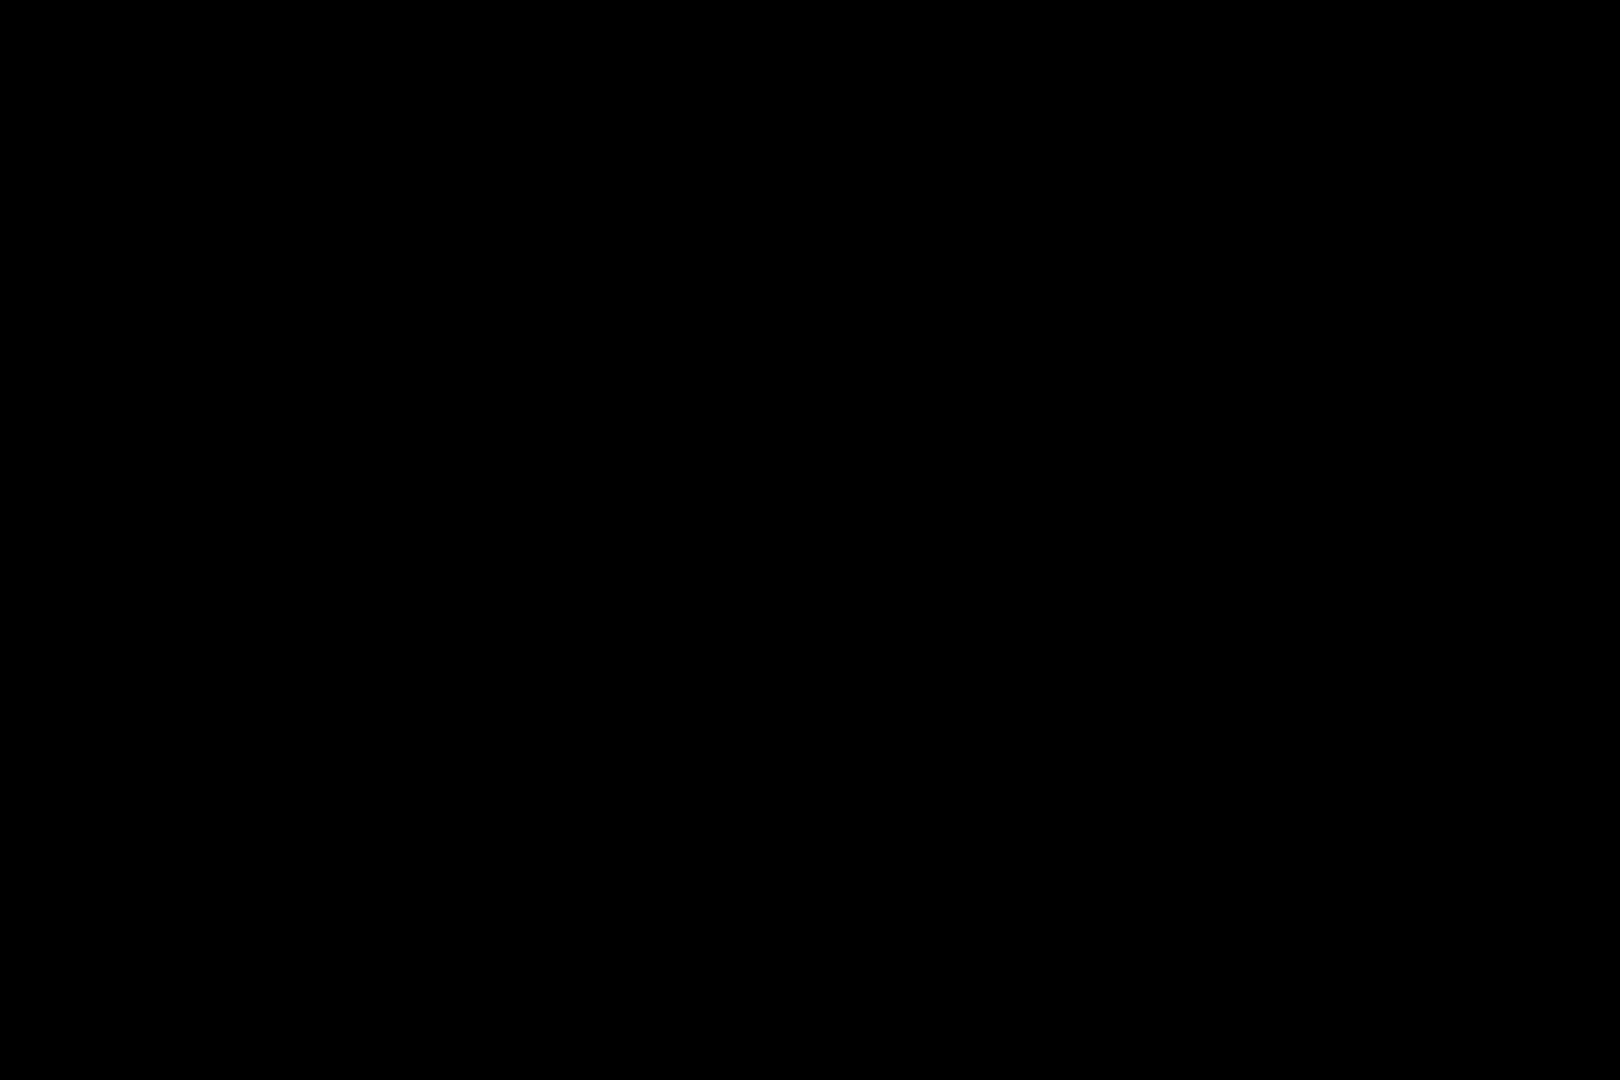 充血監督の深夜の運動会Vol.13 美女OL   0  105連発 79